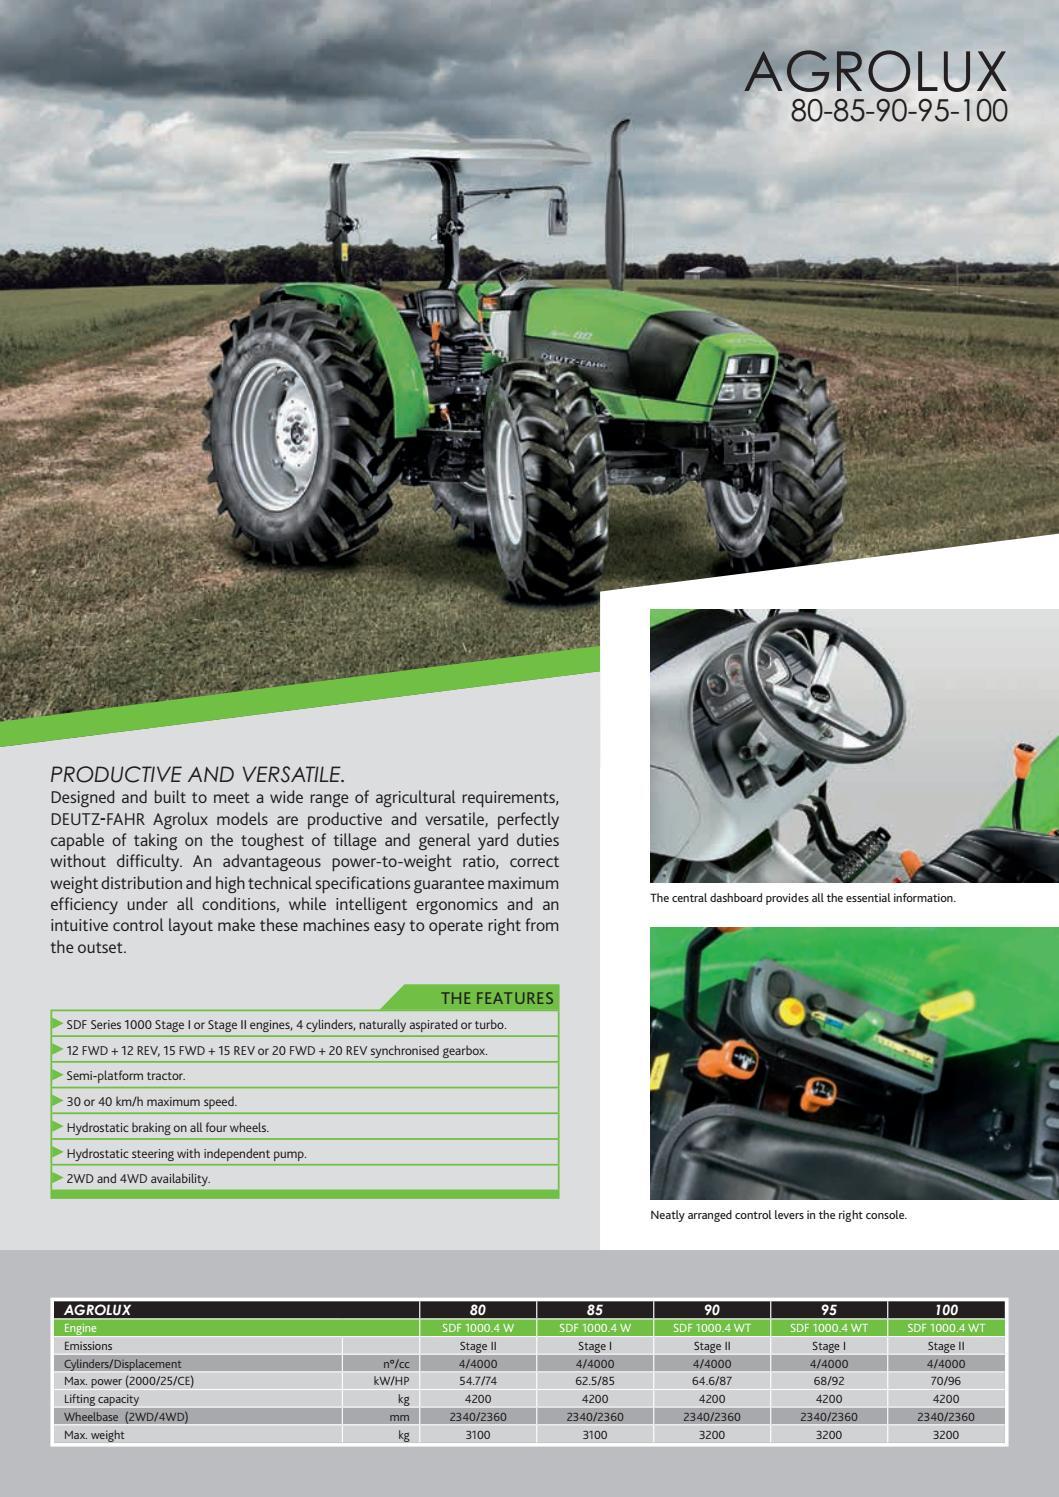 DEUTZ-FAHR Global Product range 2019 - Brochure - English by